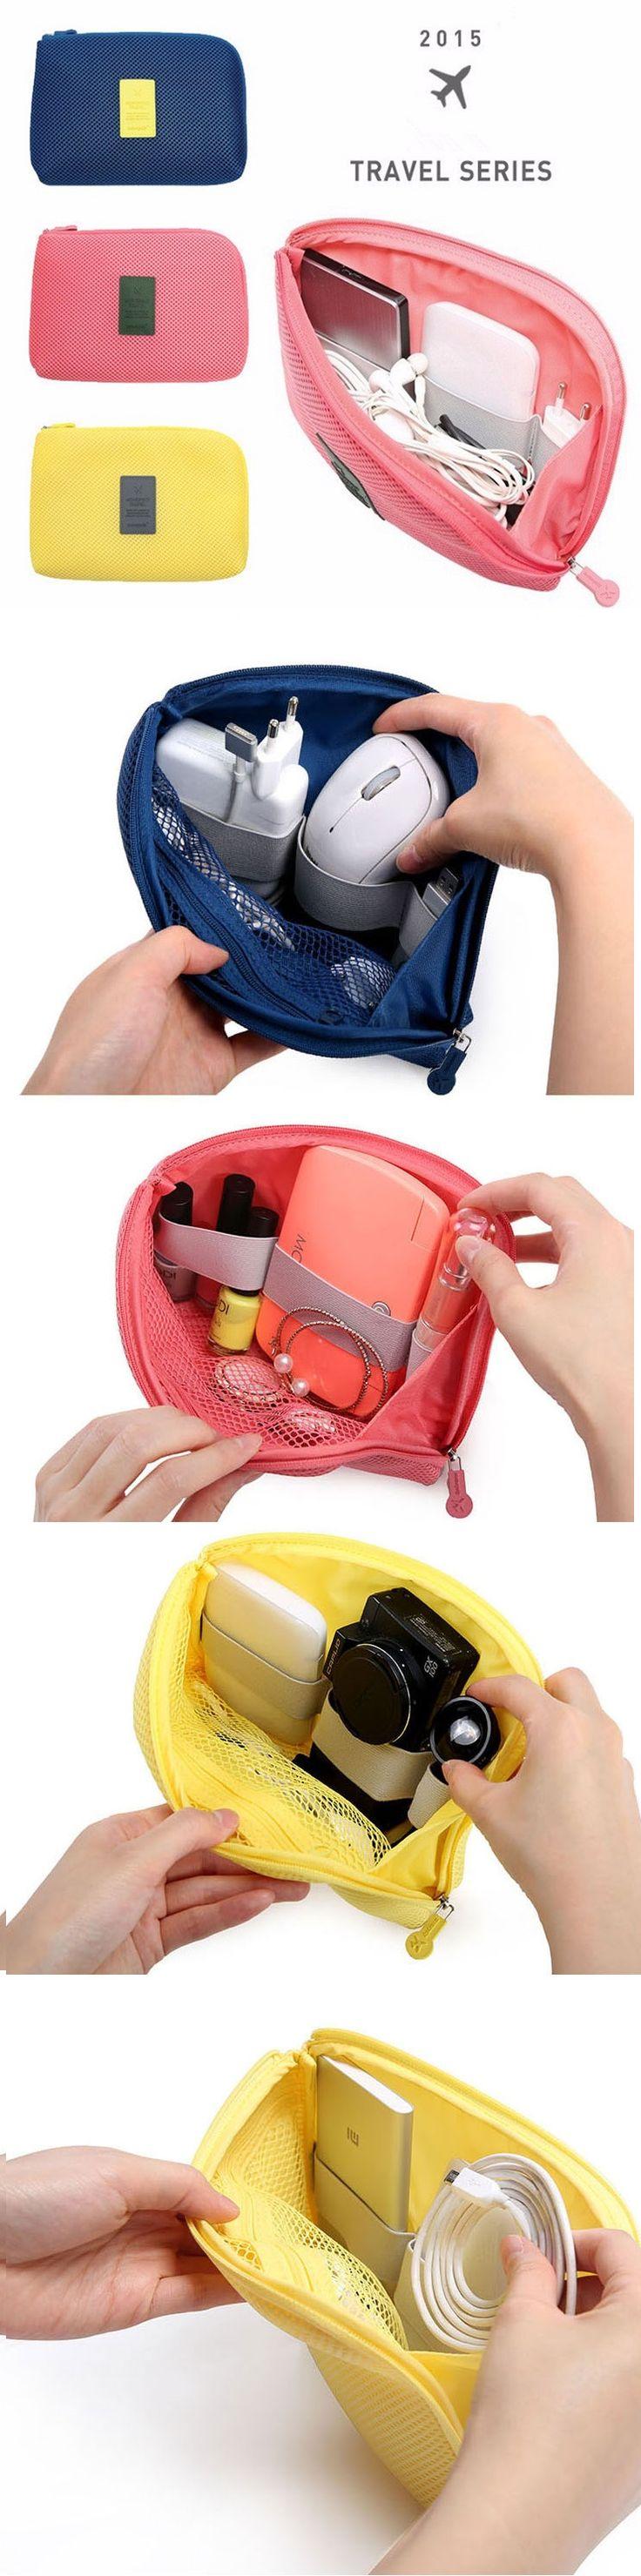 US$2.99 Multifunctional Fashion Travel Storage Bag Digital Data Cable Earphone Holder Organizer